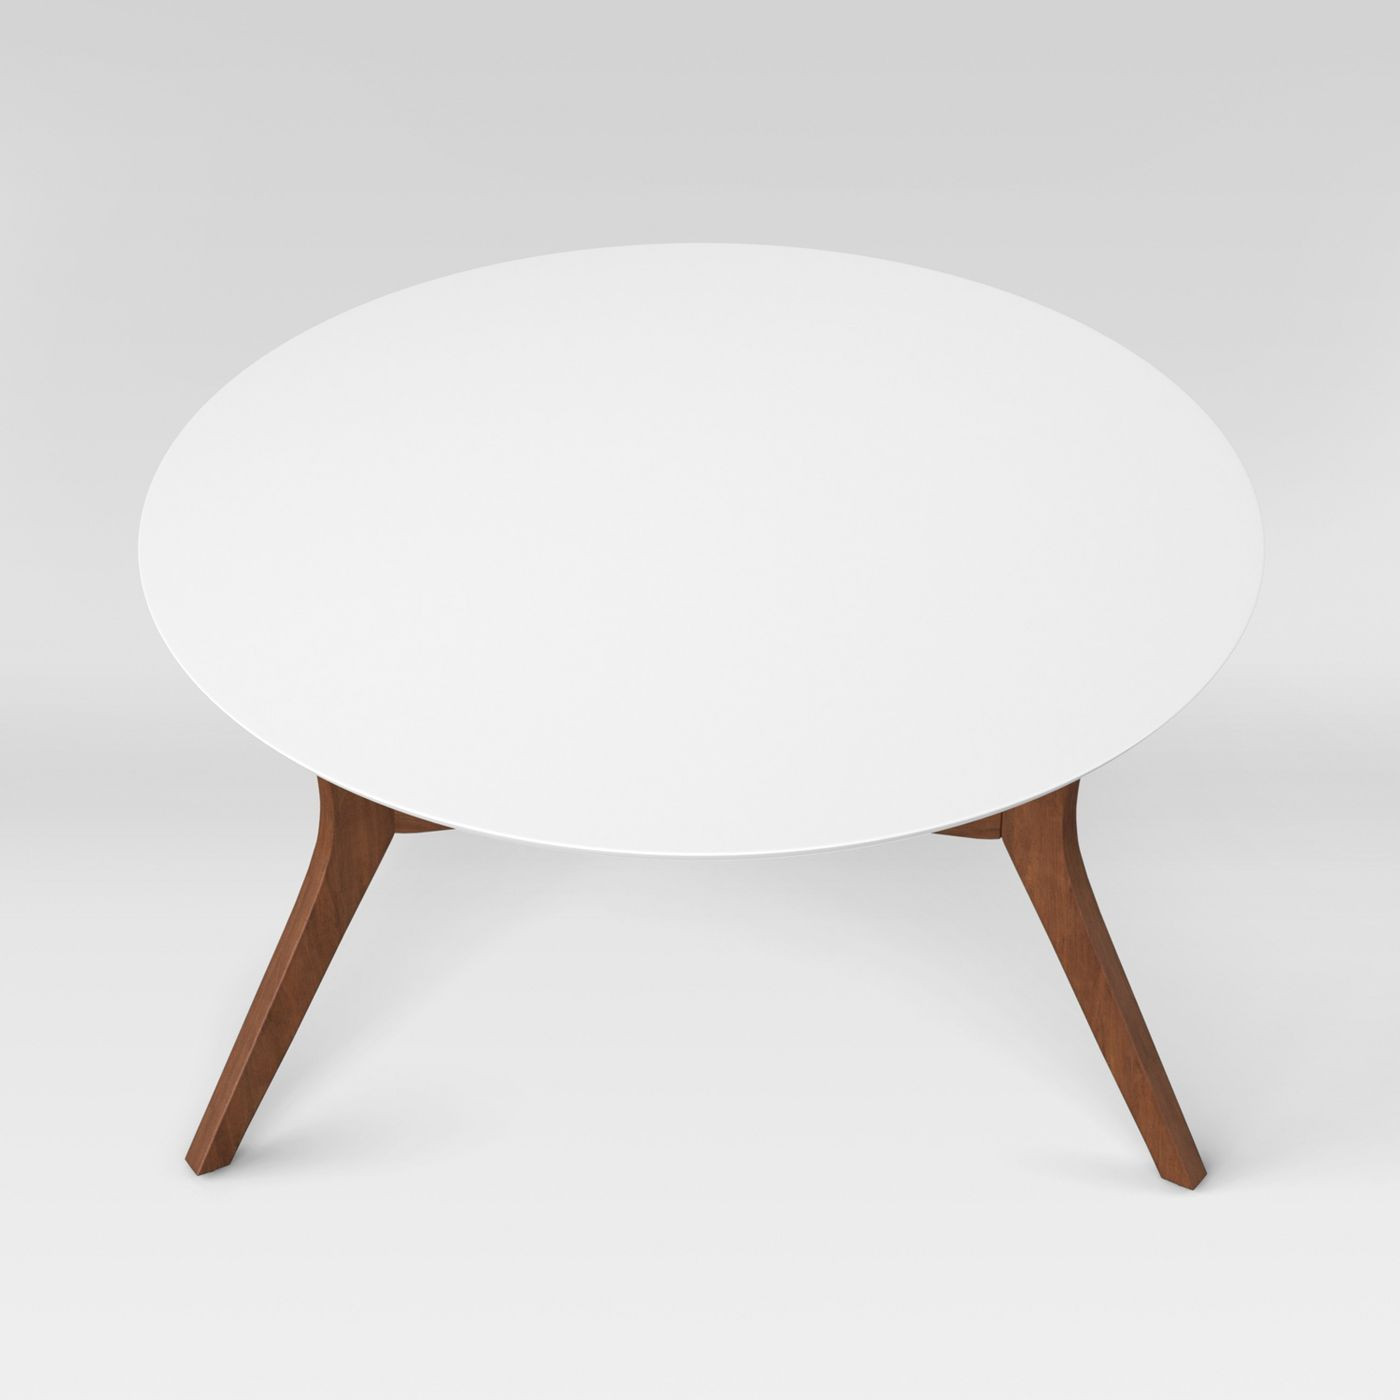 Magnificent Target Mid Century Modern Coffee Table Aptdeco Inzonedesignstudio Interior Chair Design Inzonedesignstudiocom